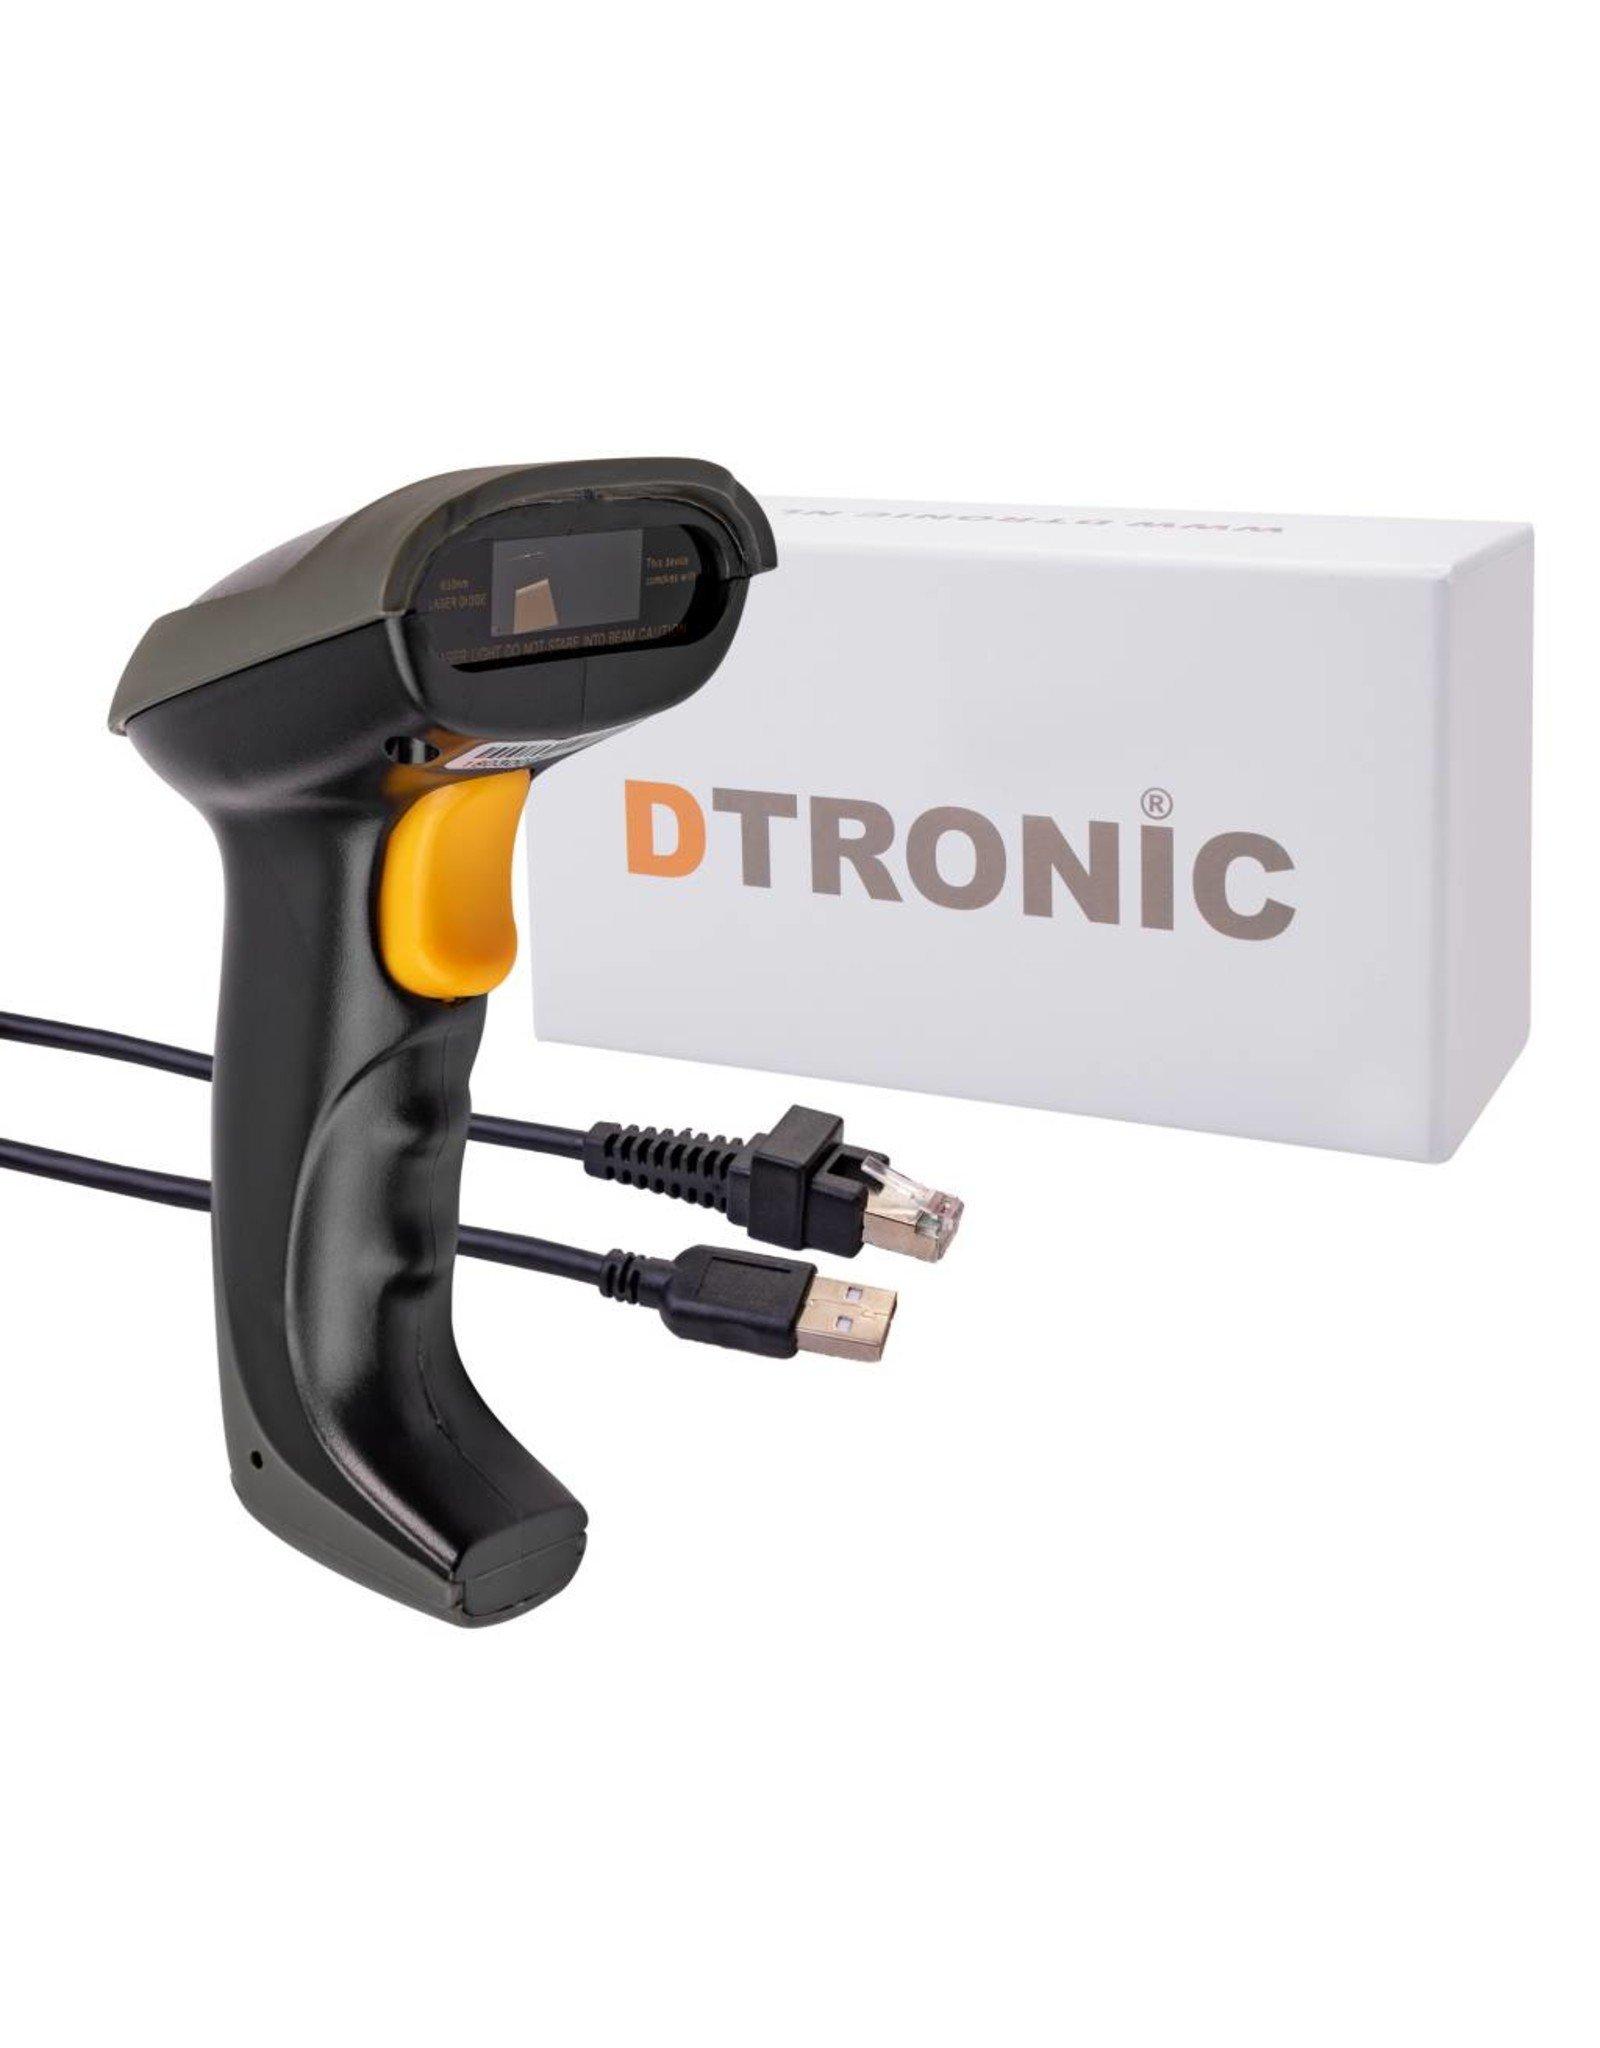 DTRONIC DTRONIC - 960